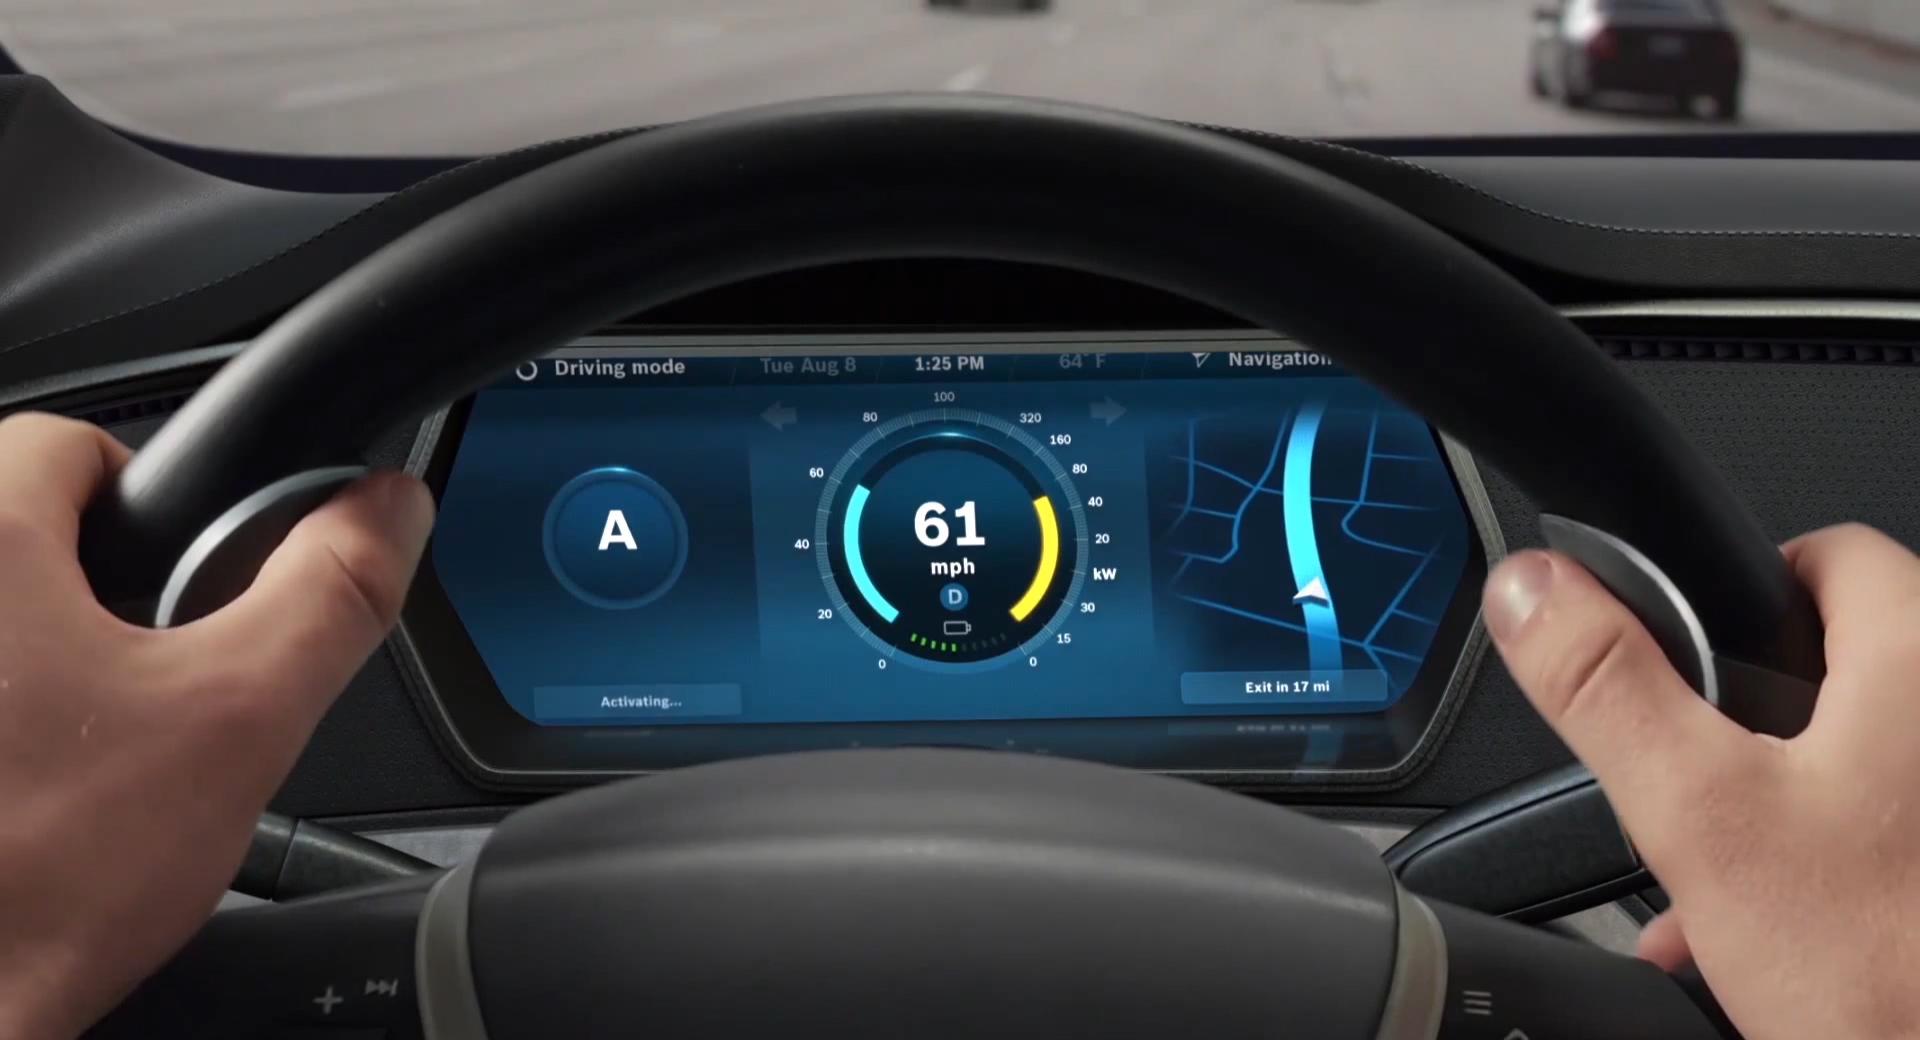 Gizmodo – Bosch Automated Car Vision